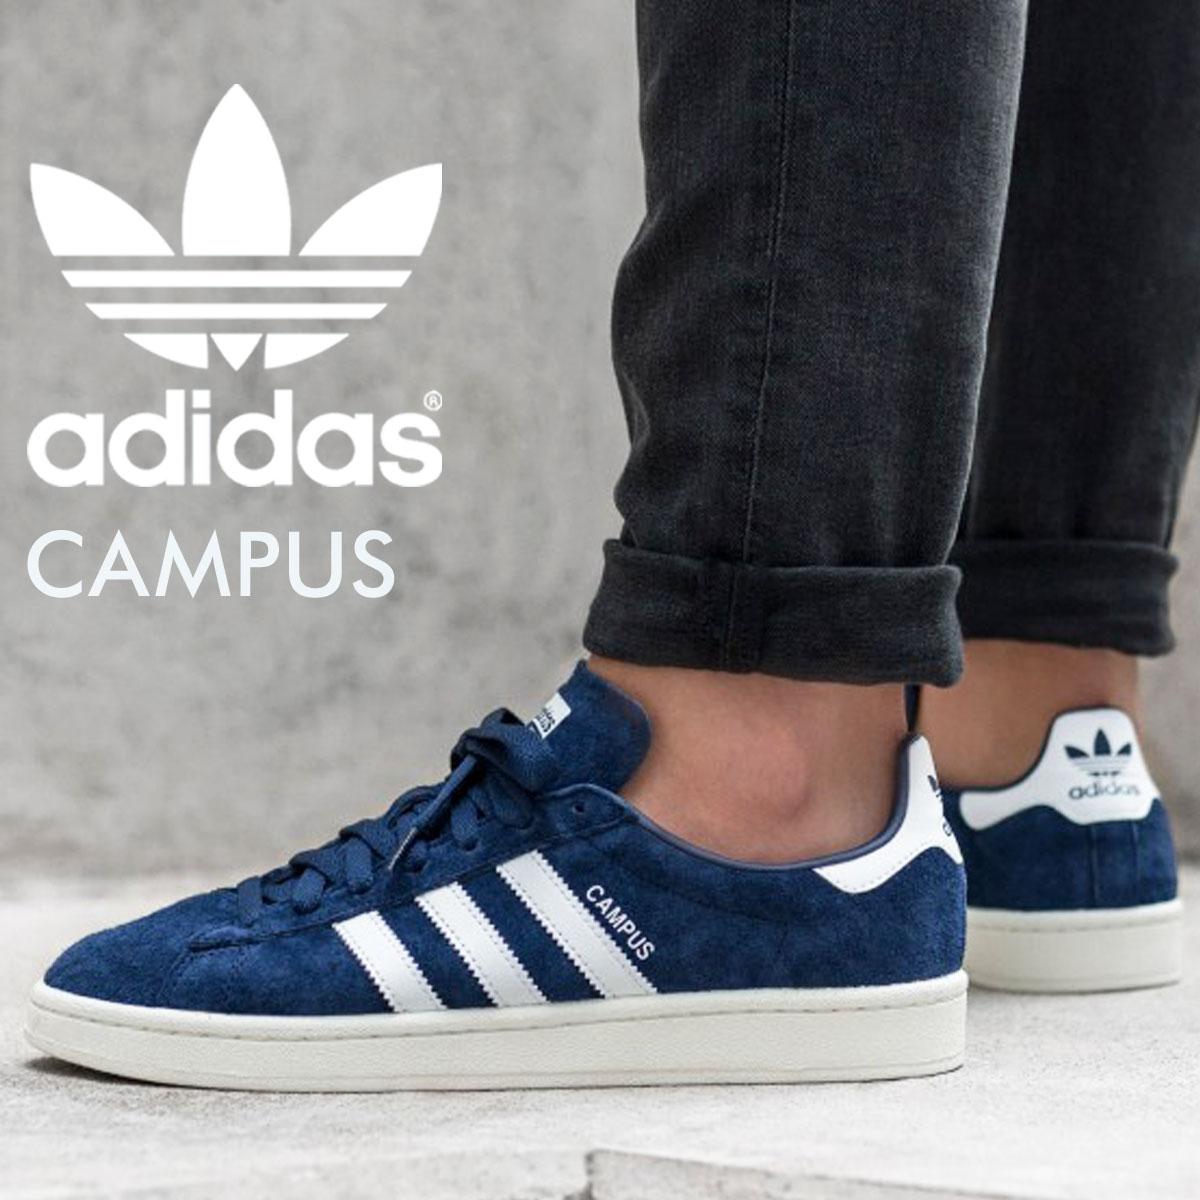 a9b02bcbbed2 楽天市場 アディダス オリジナルス キャンパス adidas Originals ...